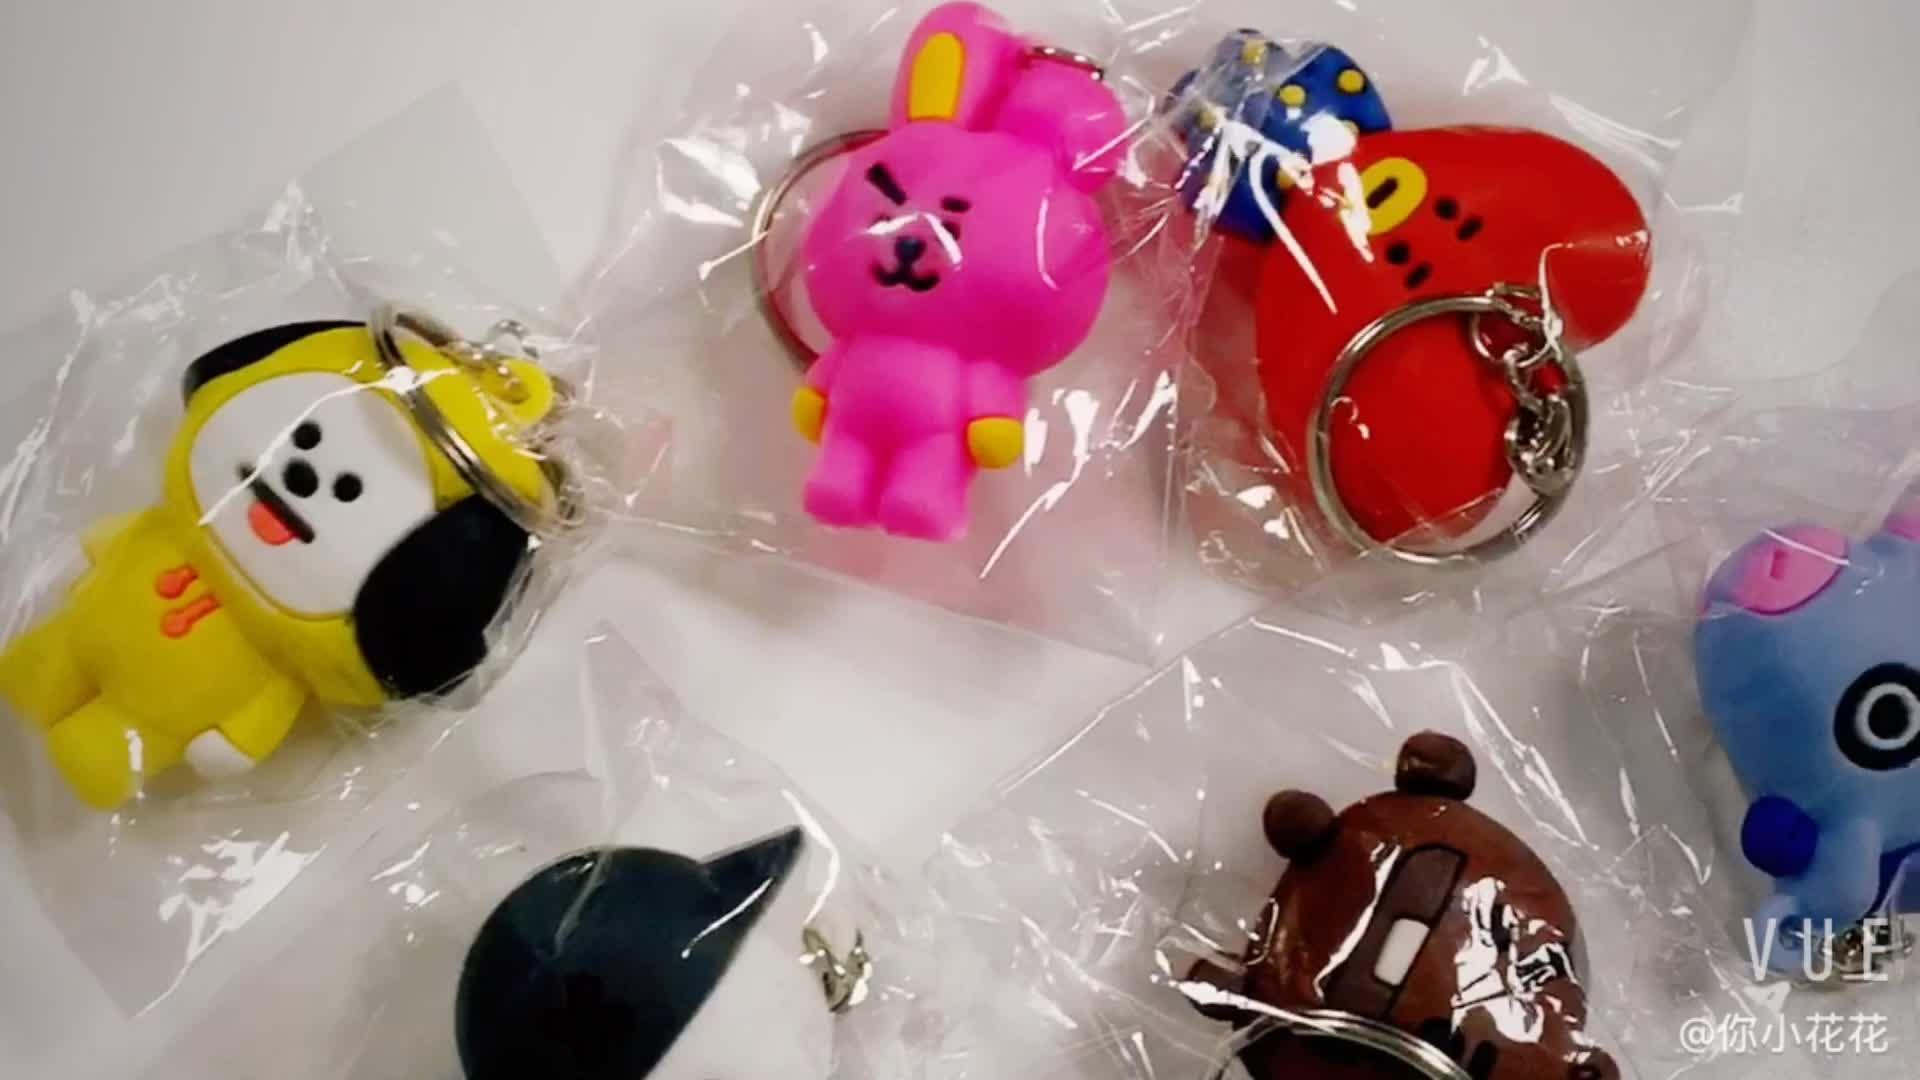 Atacado kpop Coréia estrela Personalizado pvc macio keychain do anel chave da cadeia de plástico incluindo o bing